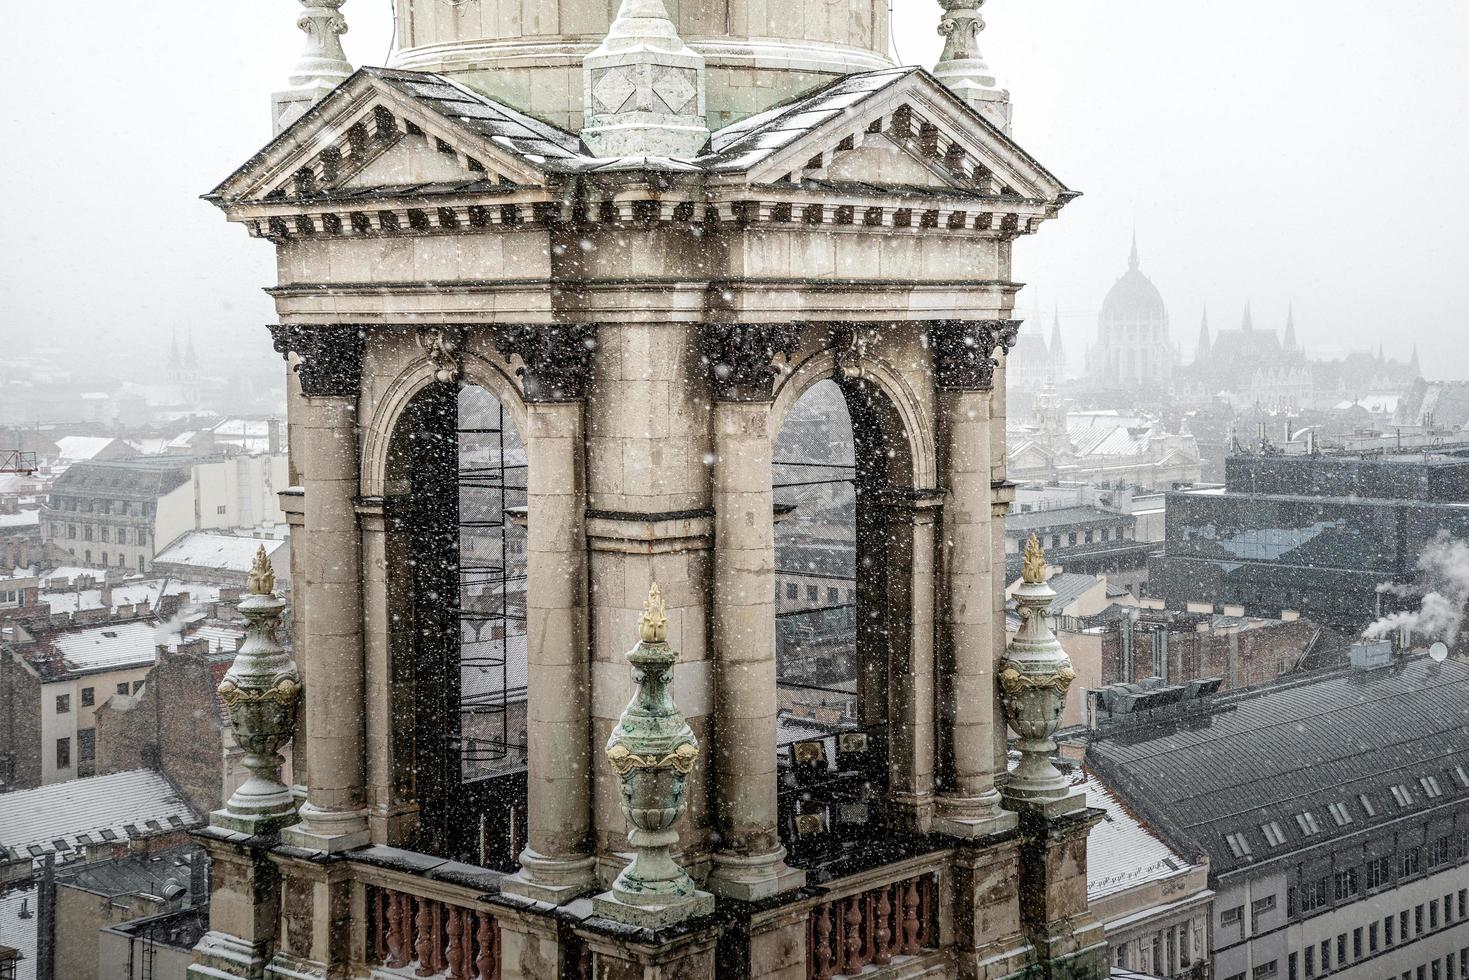 budapest, hongarije 2019 - klokkentoren van st. stephen basiliek foto